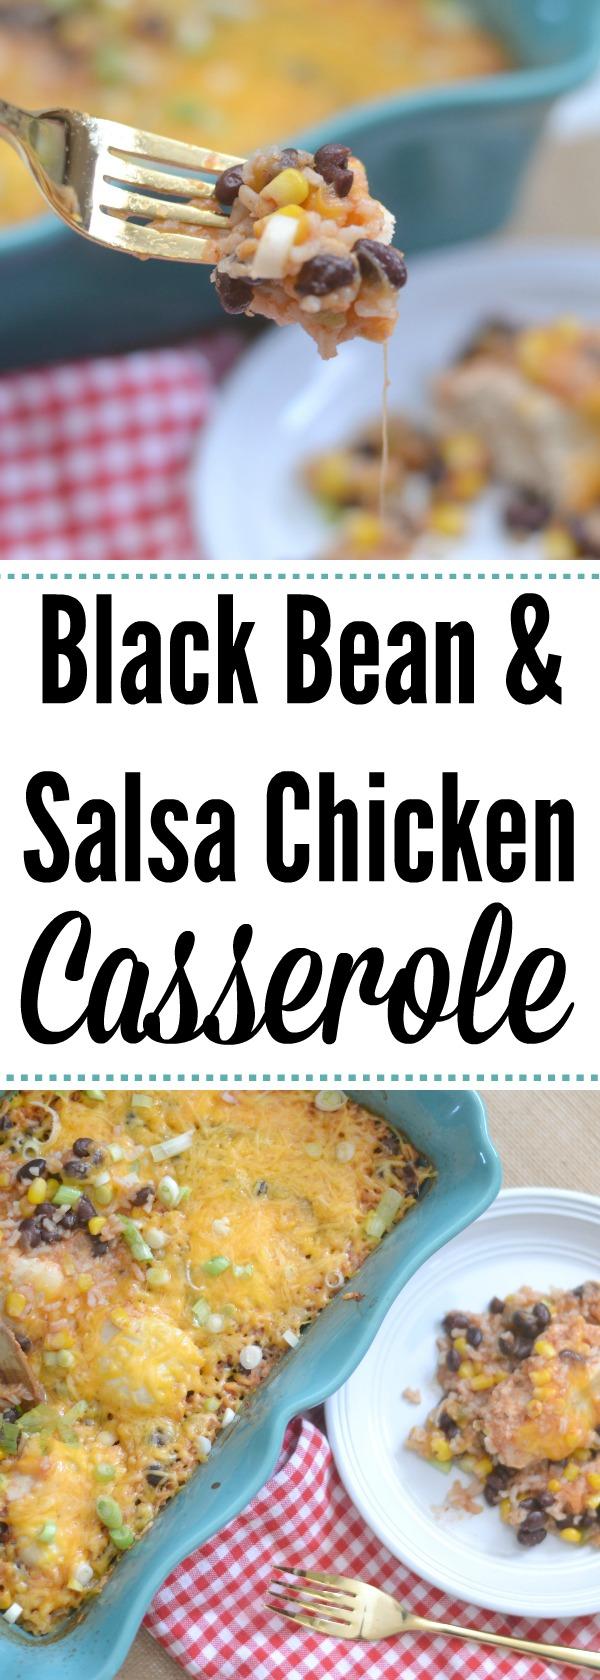 easy casserole recipes, salsa chicken recipes, salsa chicken casserole recipe, one pan chicken recipe, black bean salsa chicken casserole, recipes using black beans, easy dinner recipes, dinner casseroles